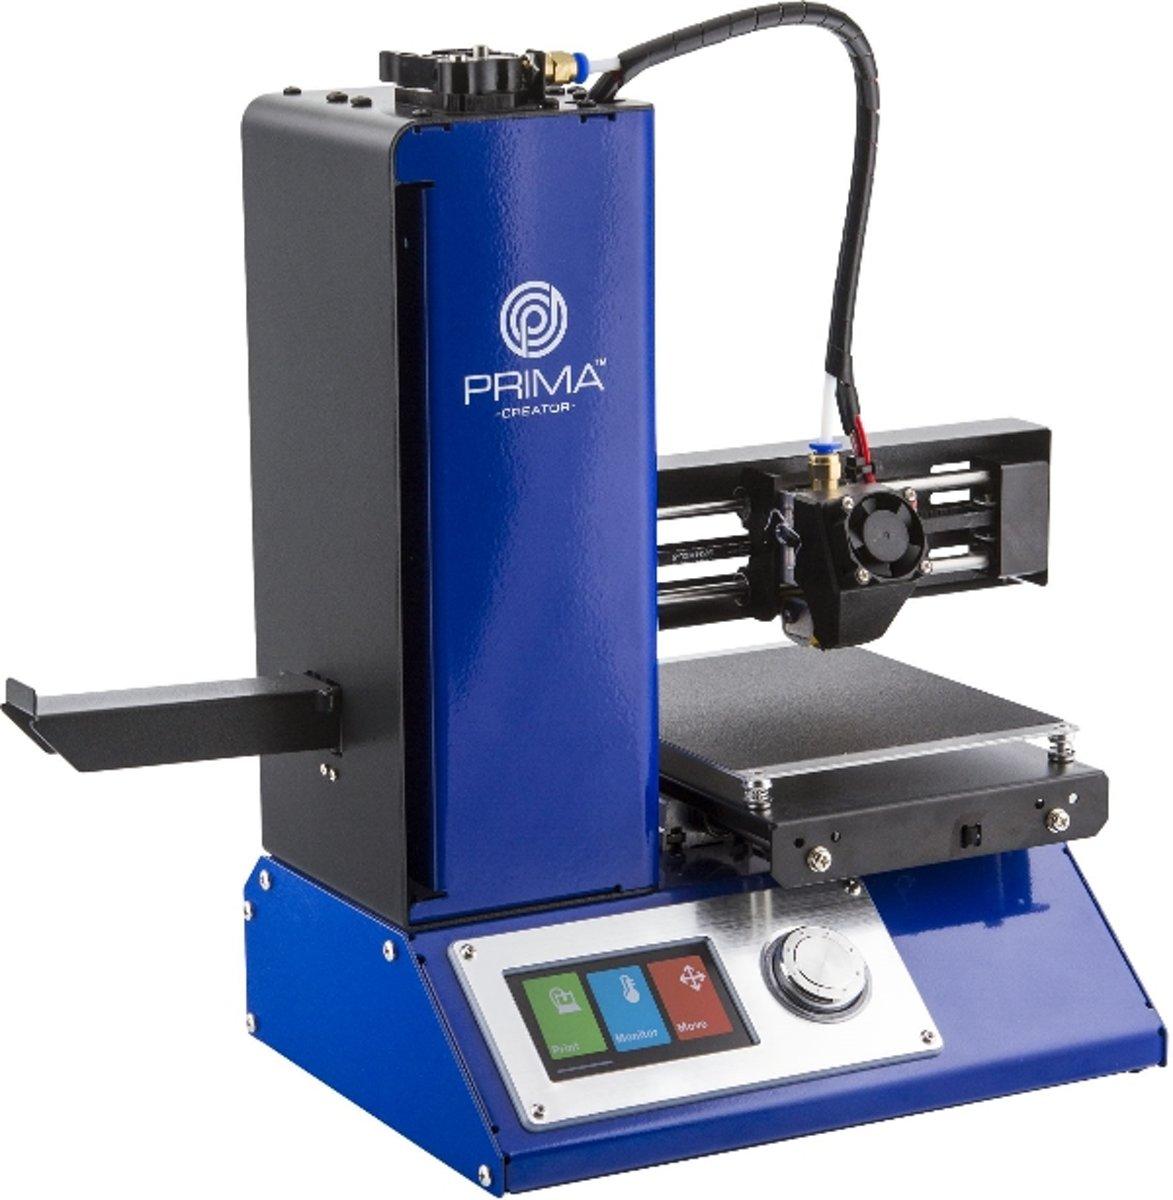 PrimaCreator P120 v2 3D-printer plug & play